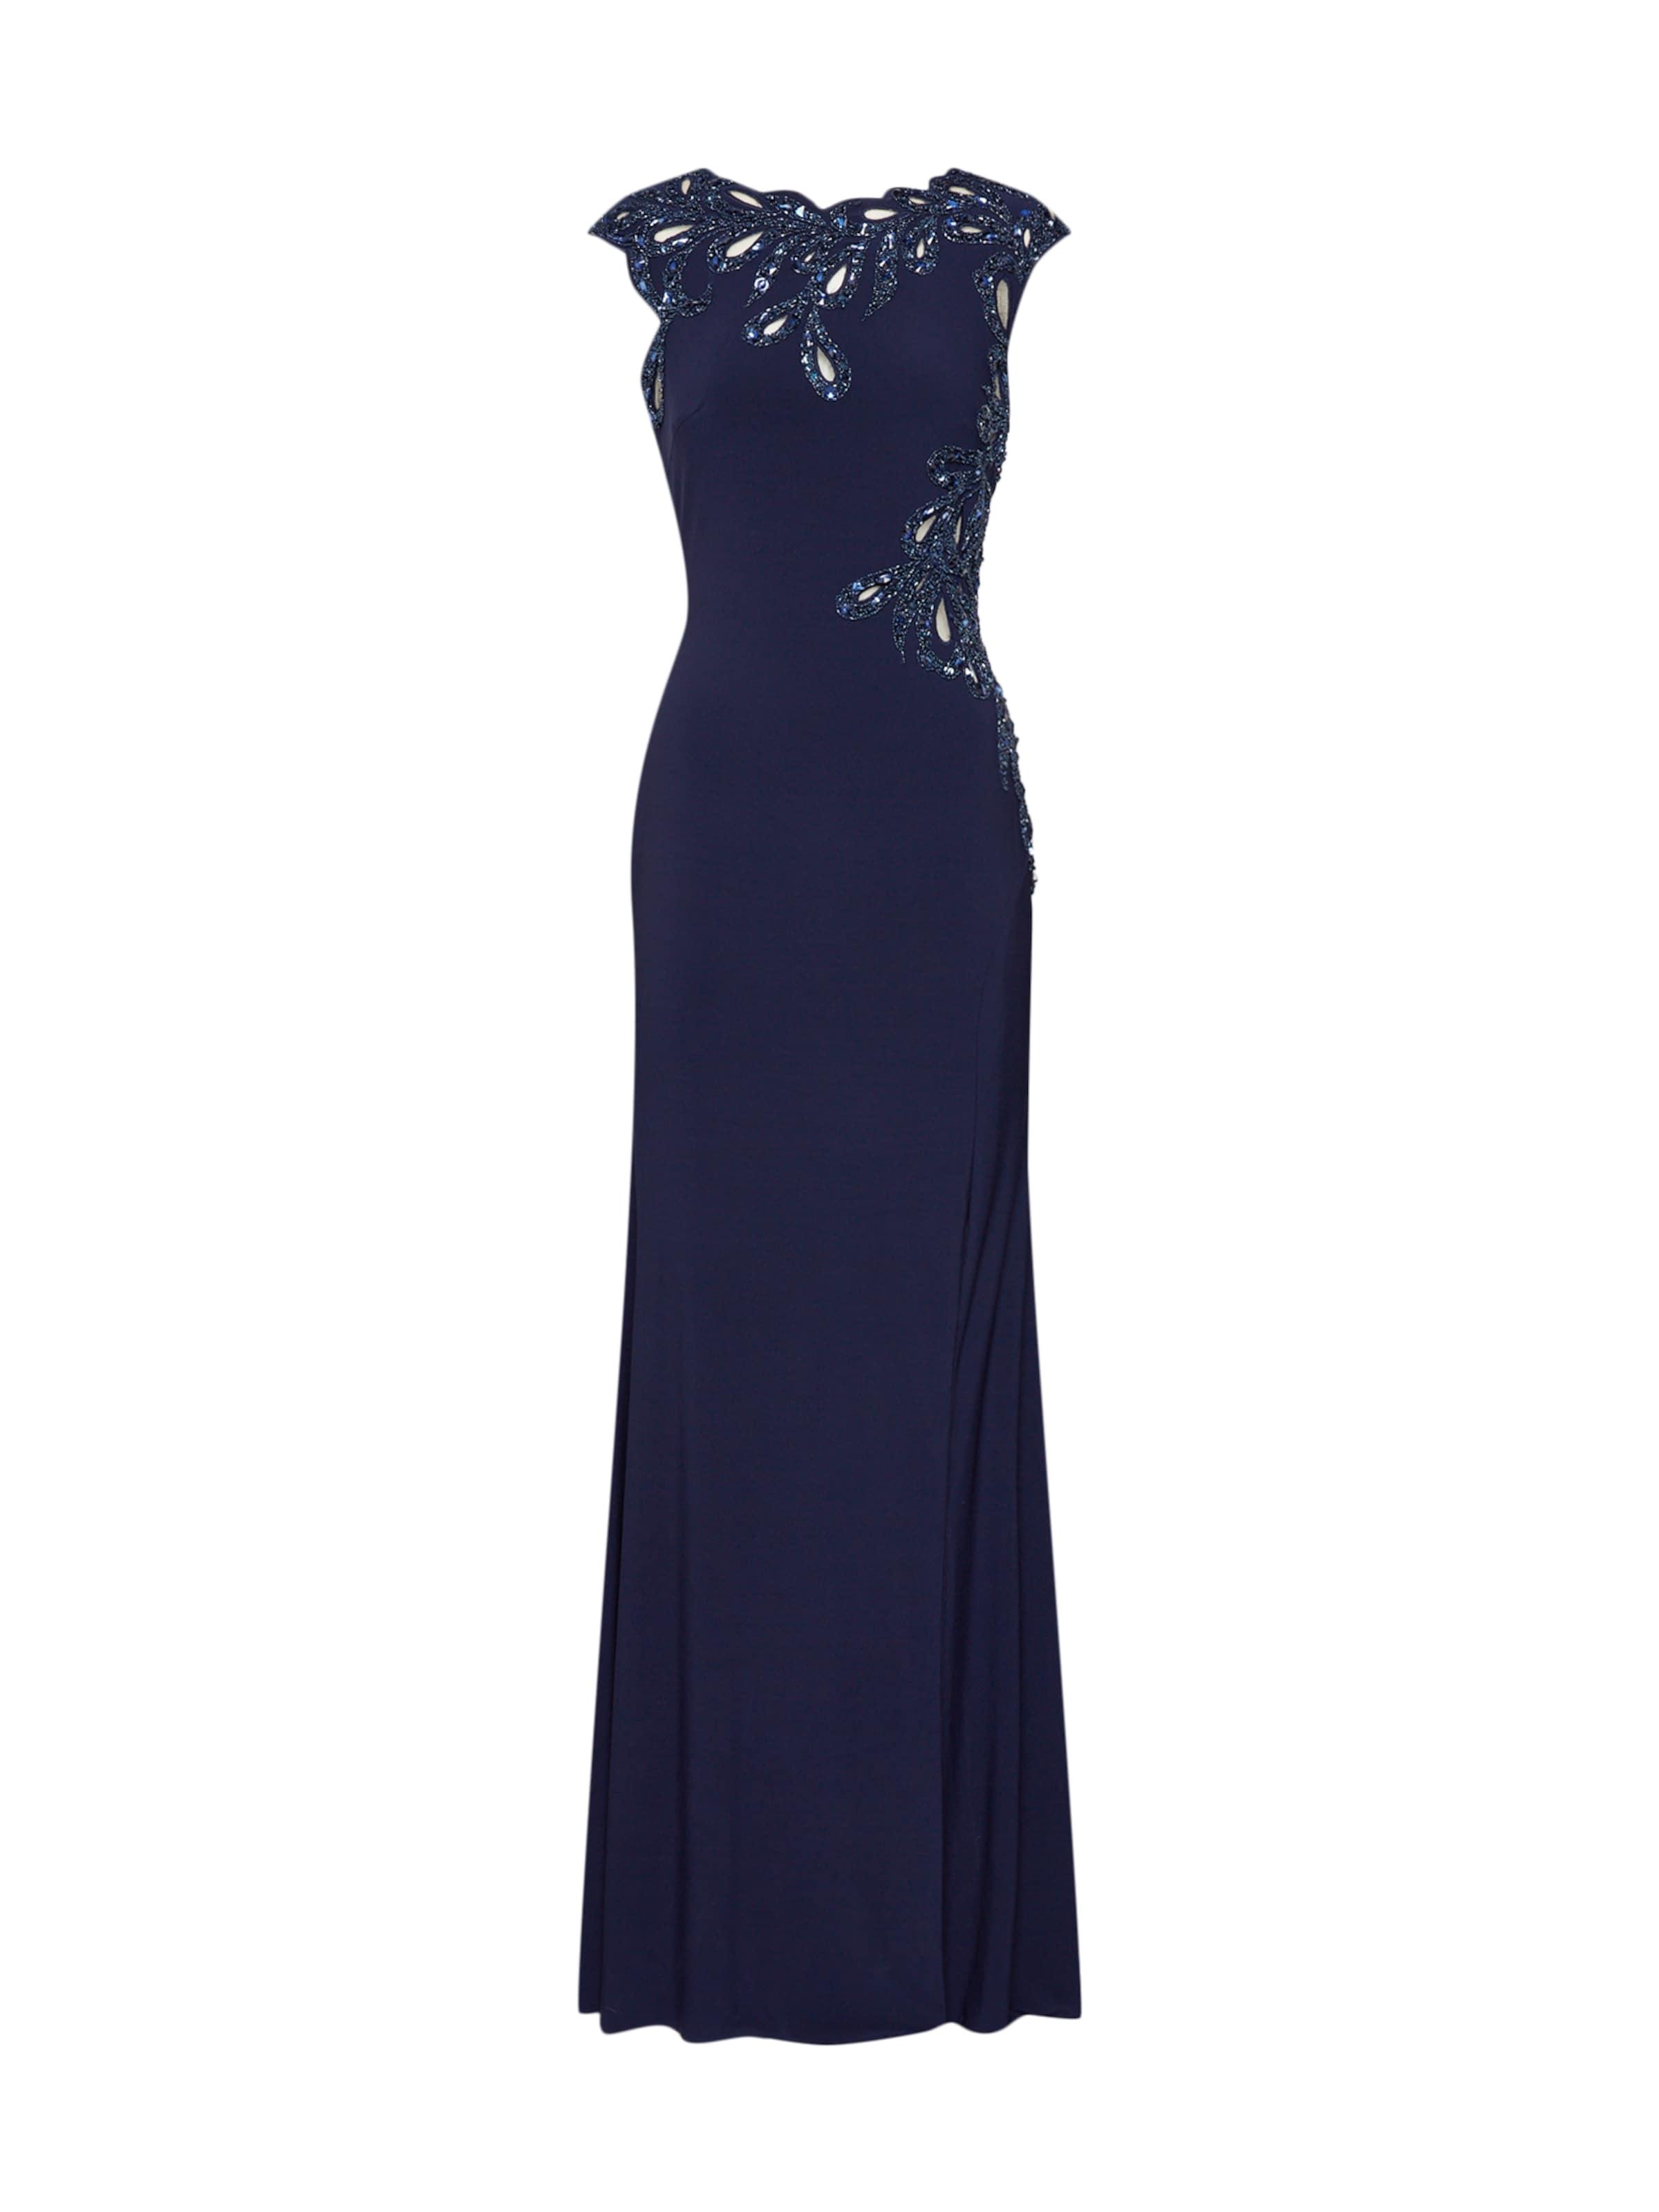 Luxuar Luxuar Abendkleid In Nachtblau Abendkleid Abendkleid In Nachtblau Luxuar Abendkleid Nachtblau In Luxuar In LUzpqVMSG